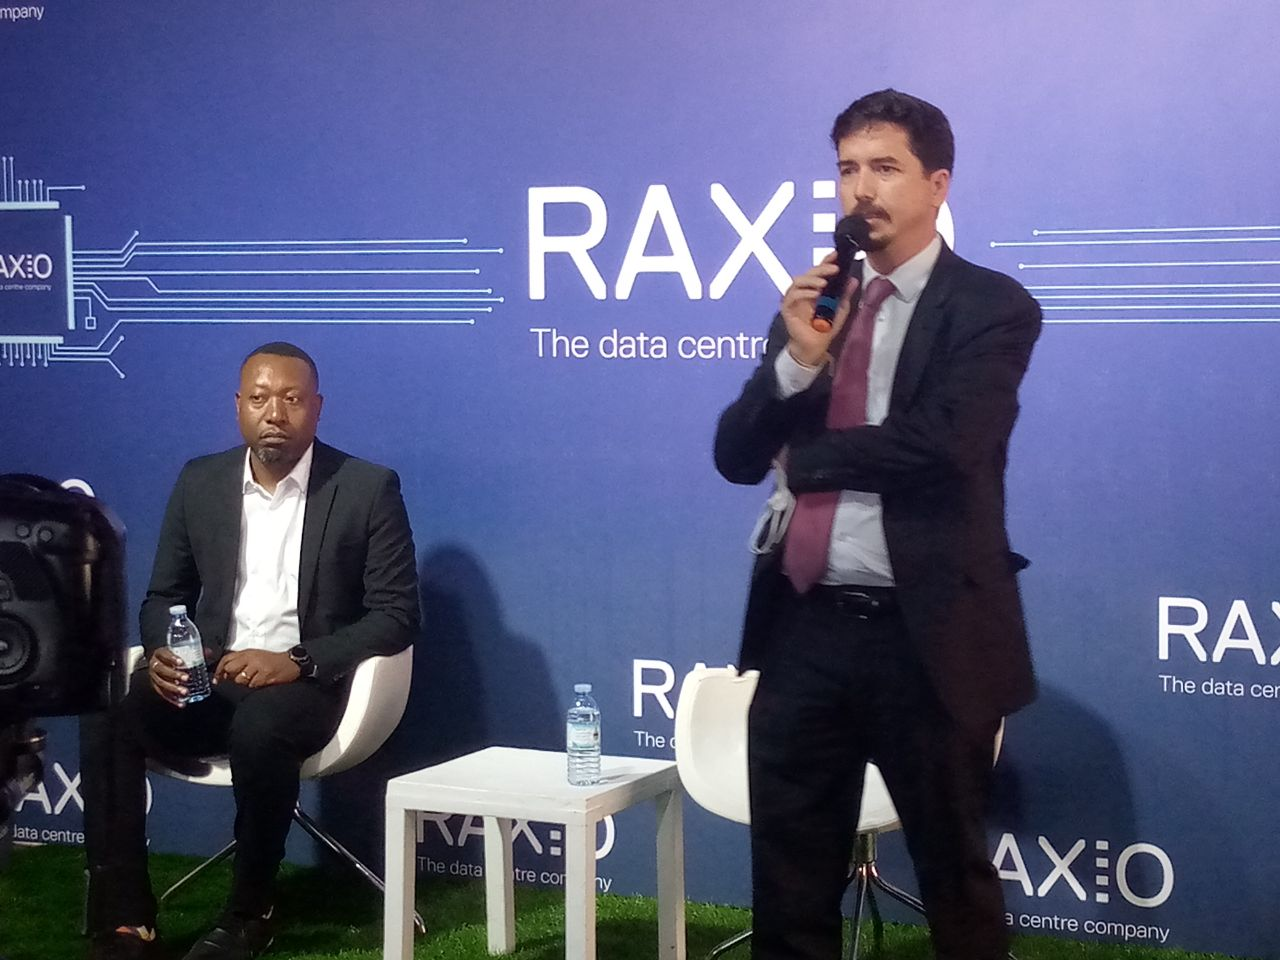 Raxio chief executive officer Mr Robert Mullins